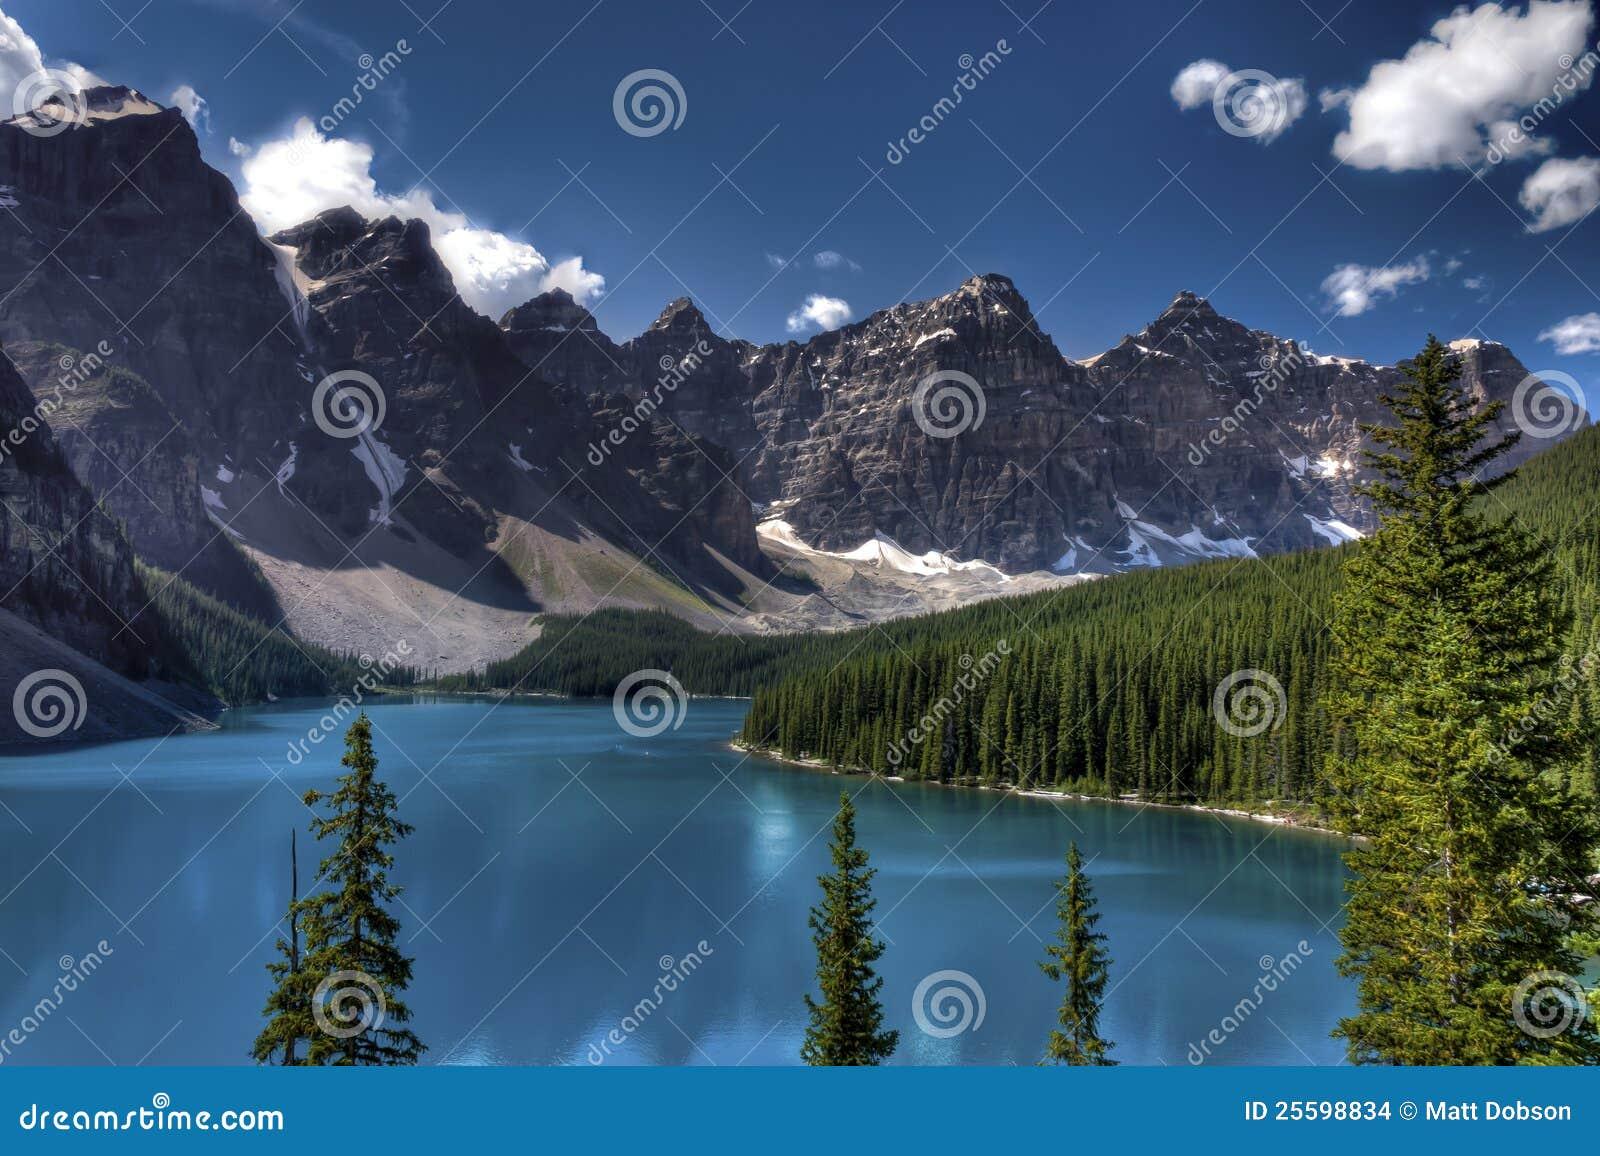 Moraine lake, Banff National Park, Canada